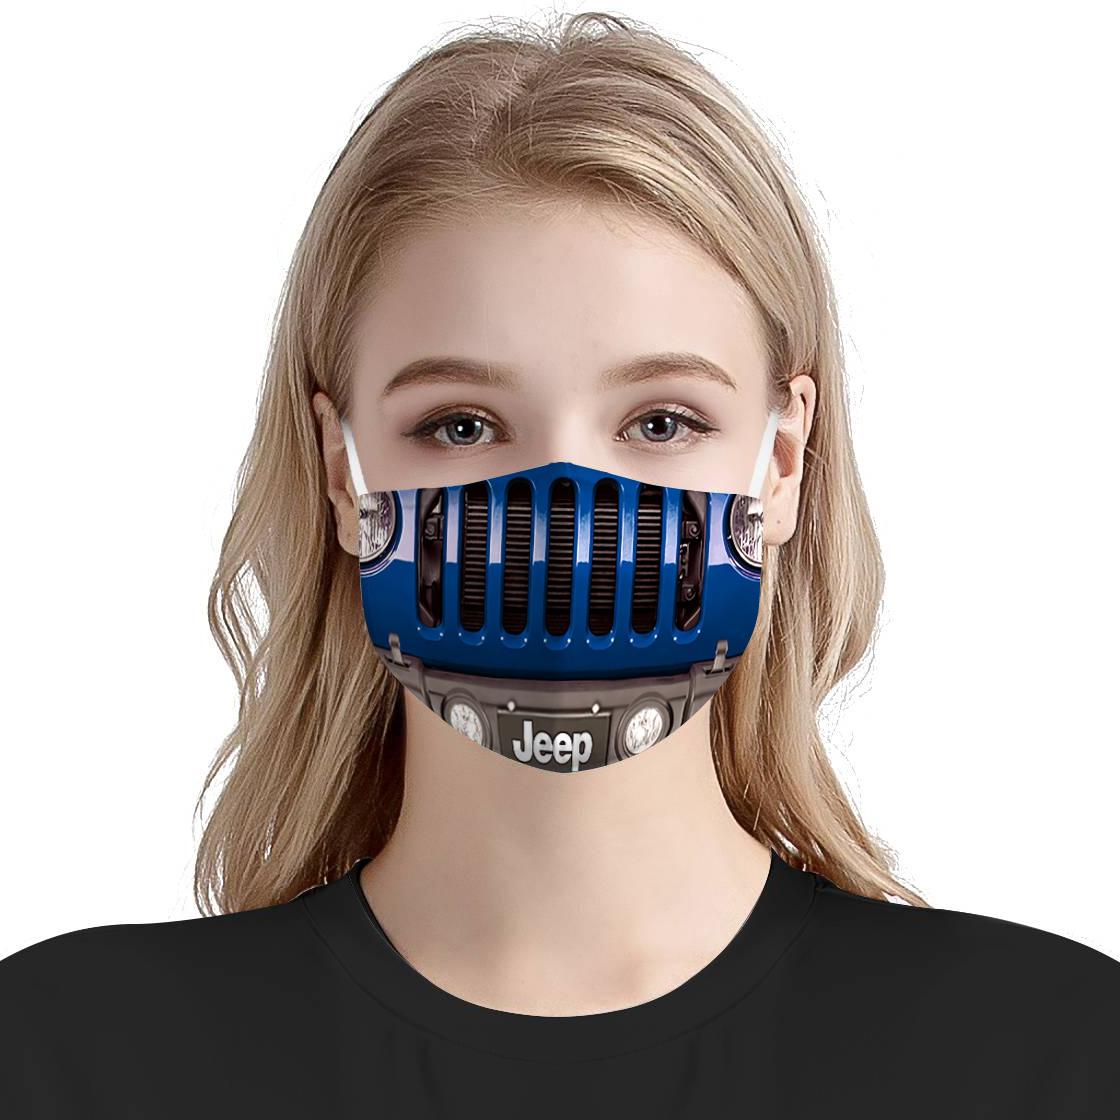 Jeep wrangler face mask